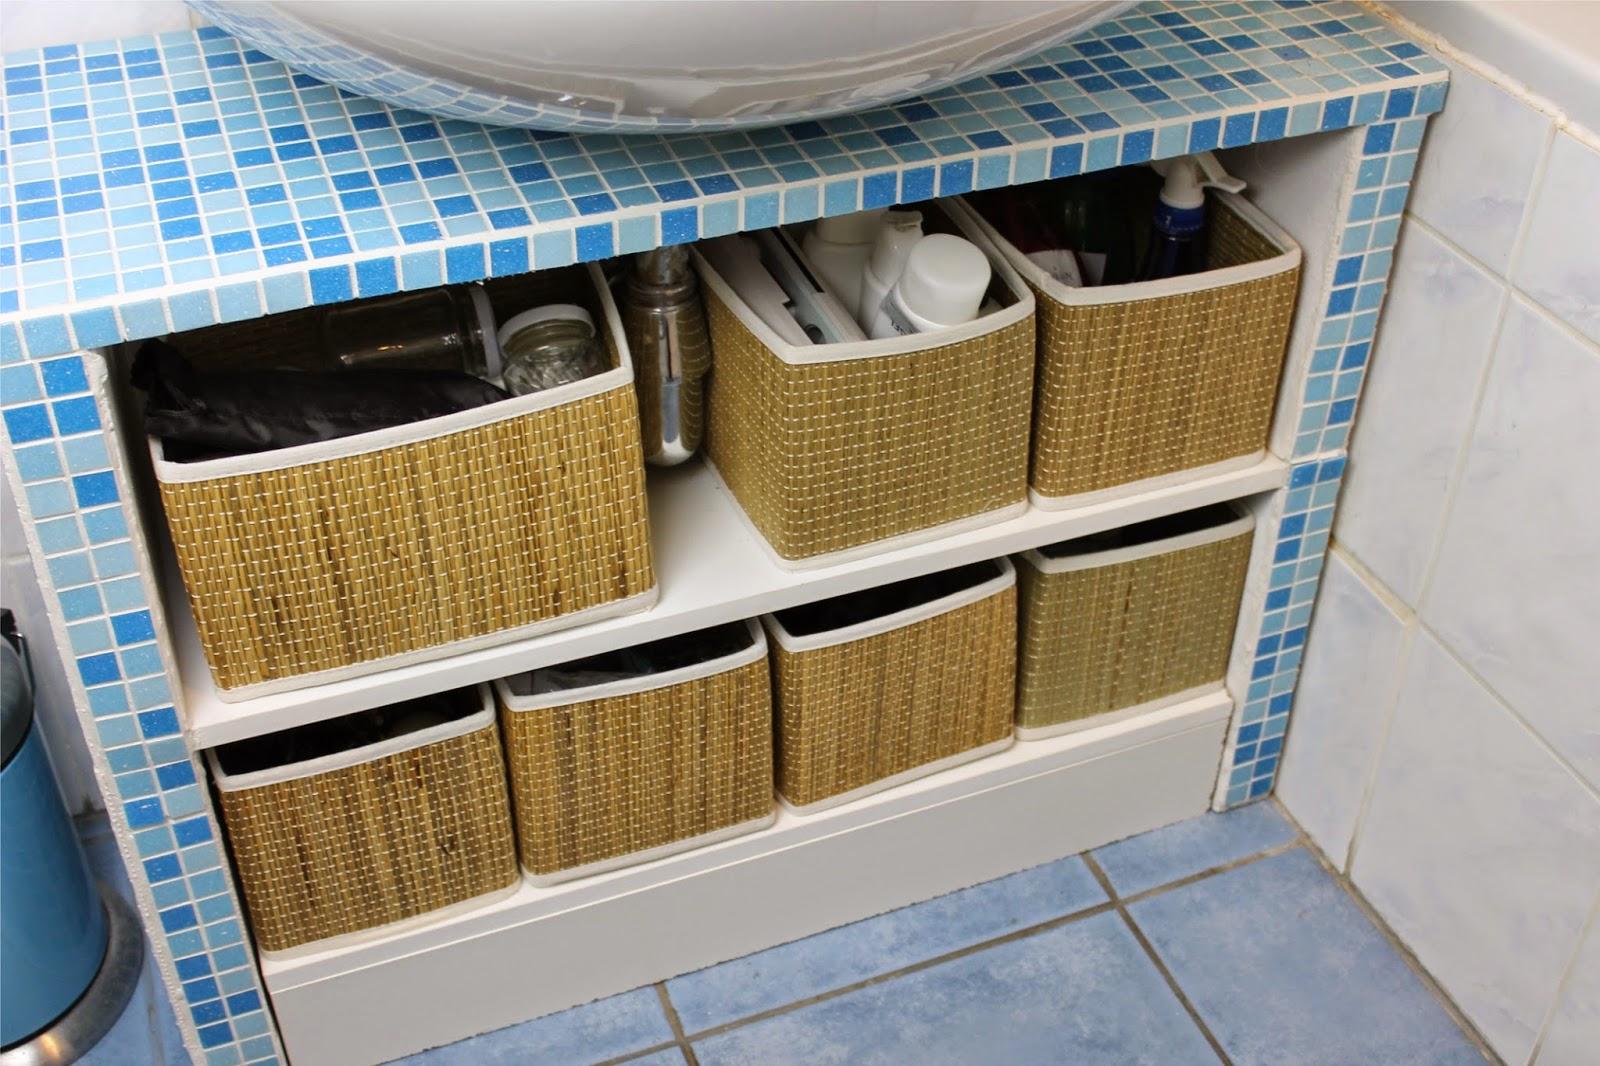 keuken rvs wandpanelen. Black Bedroom Furniture Sets. Home Design Ideas